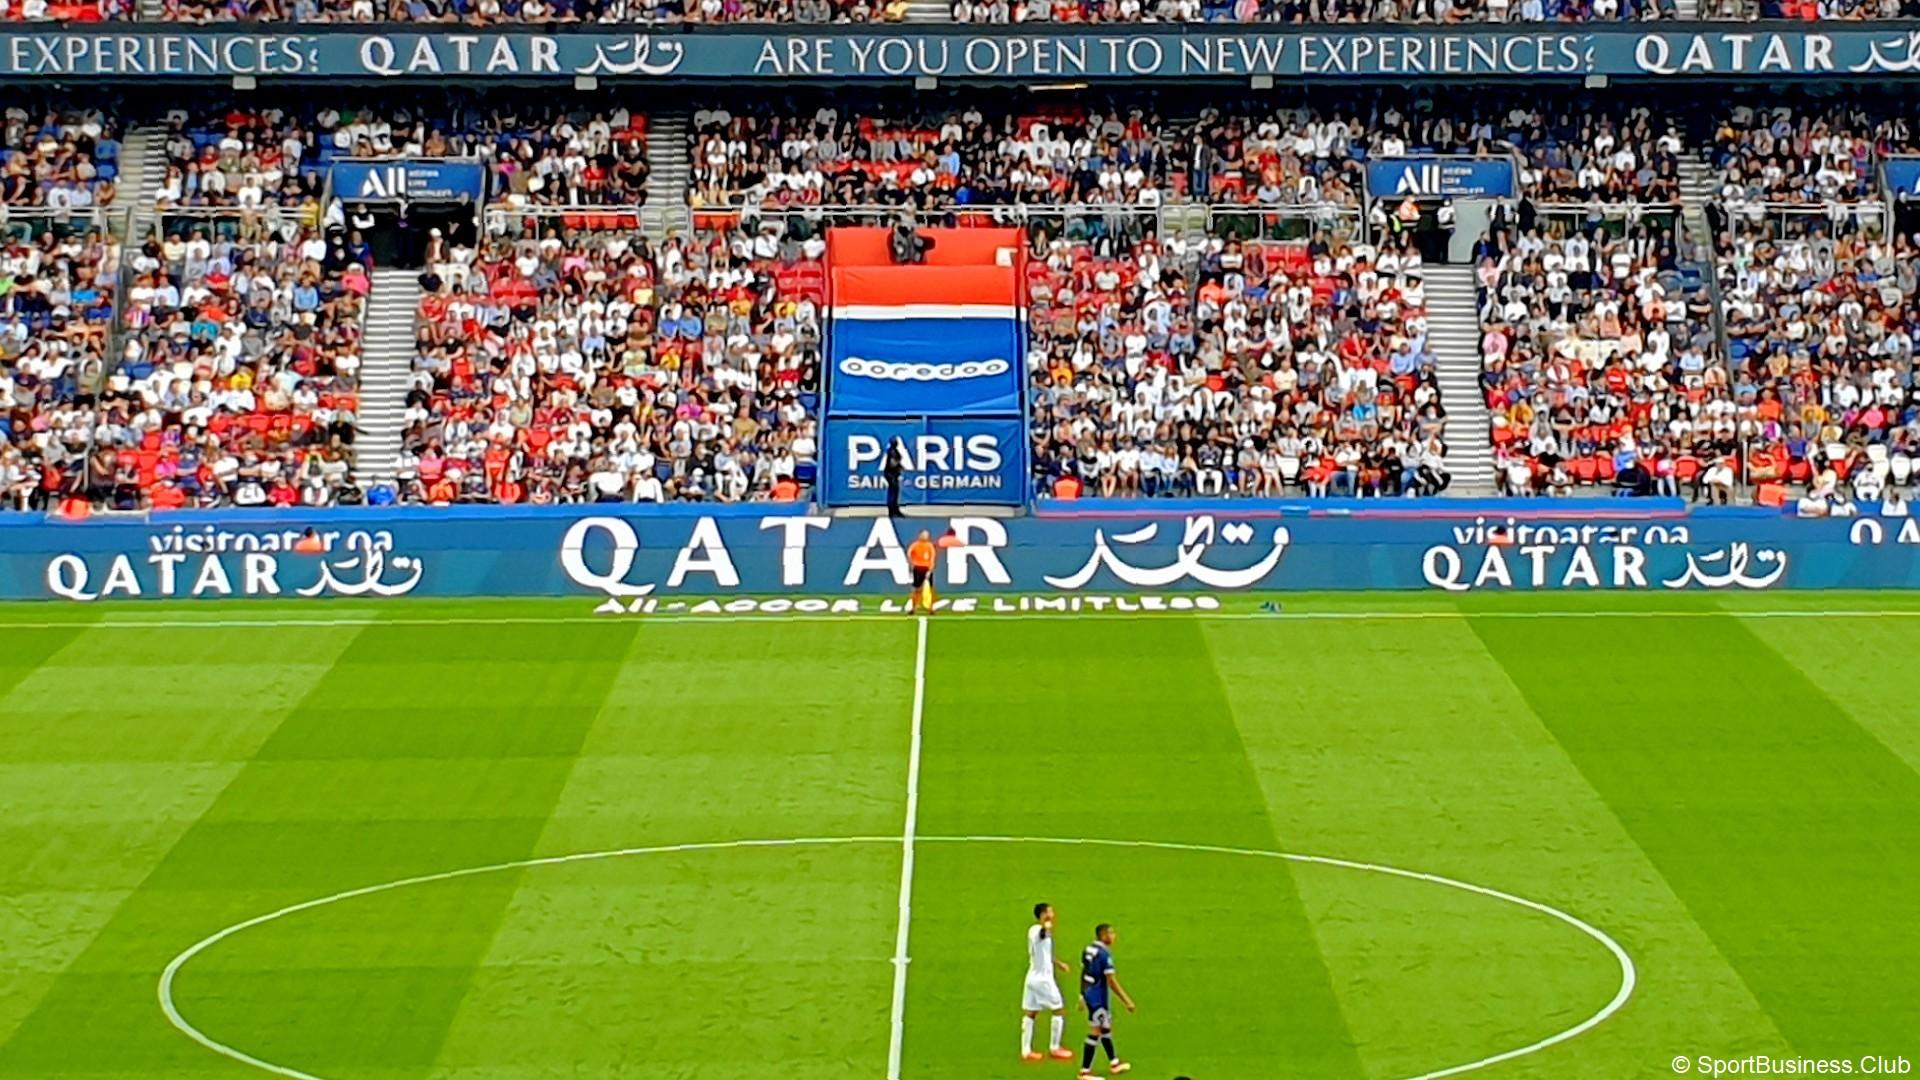 Qatar x Paris Saint-Germain (football) Pub Led